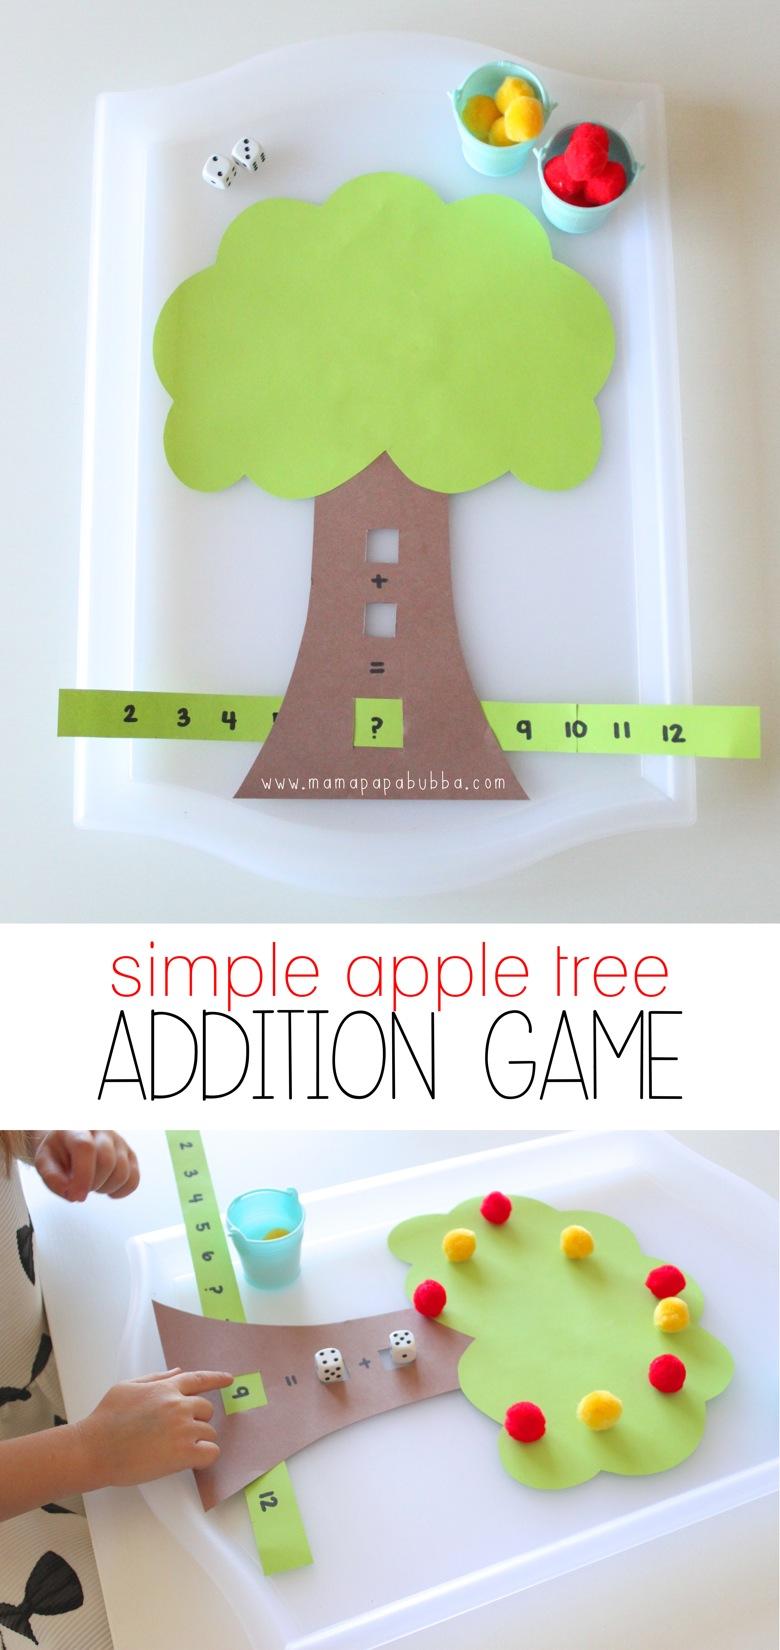 Simple Apple Tree Addition Game Mama Papa Bubba